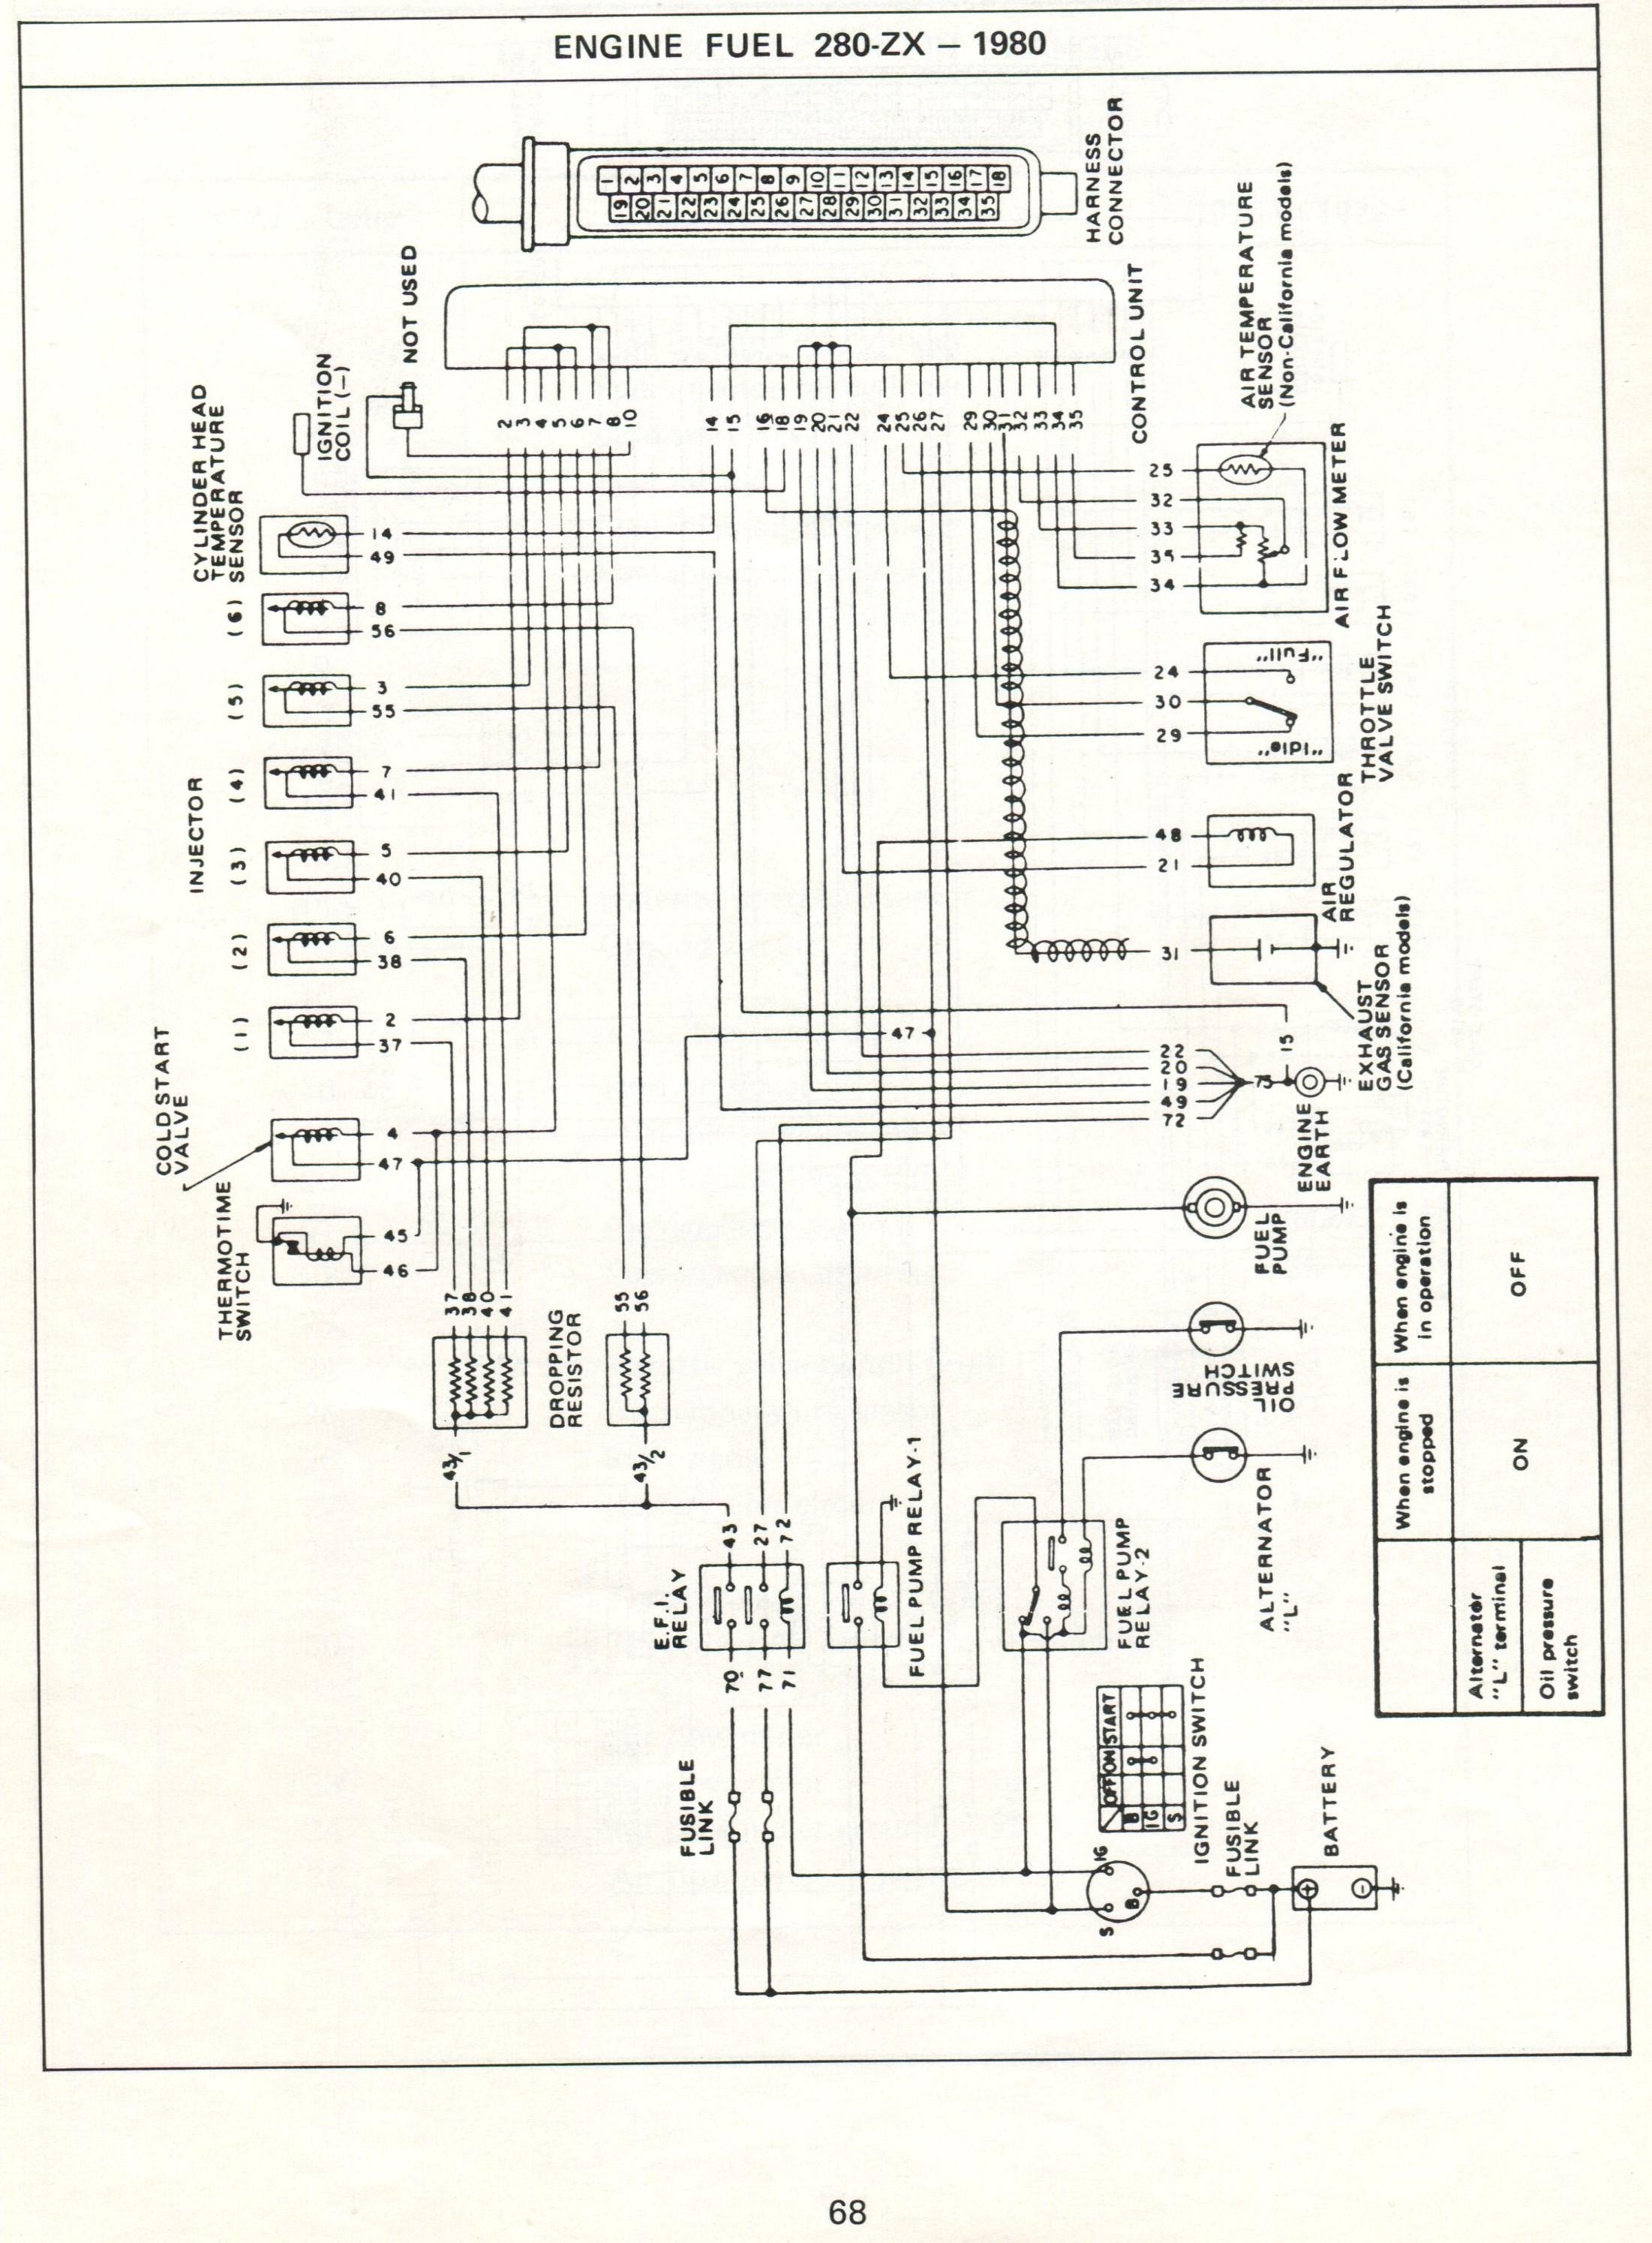 Schematic Fuel Injector Wiring Diagram